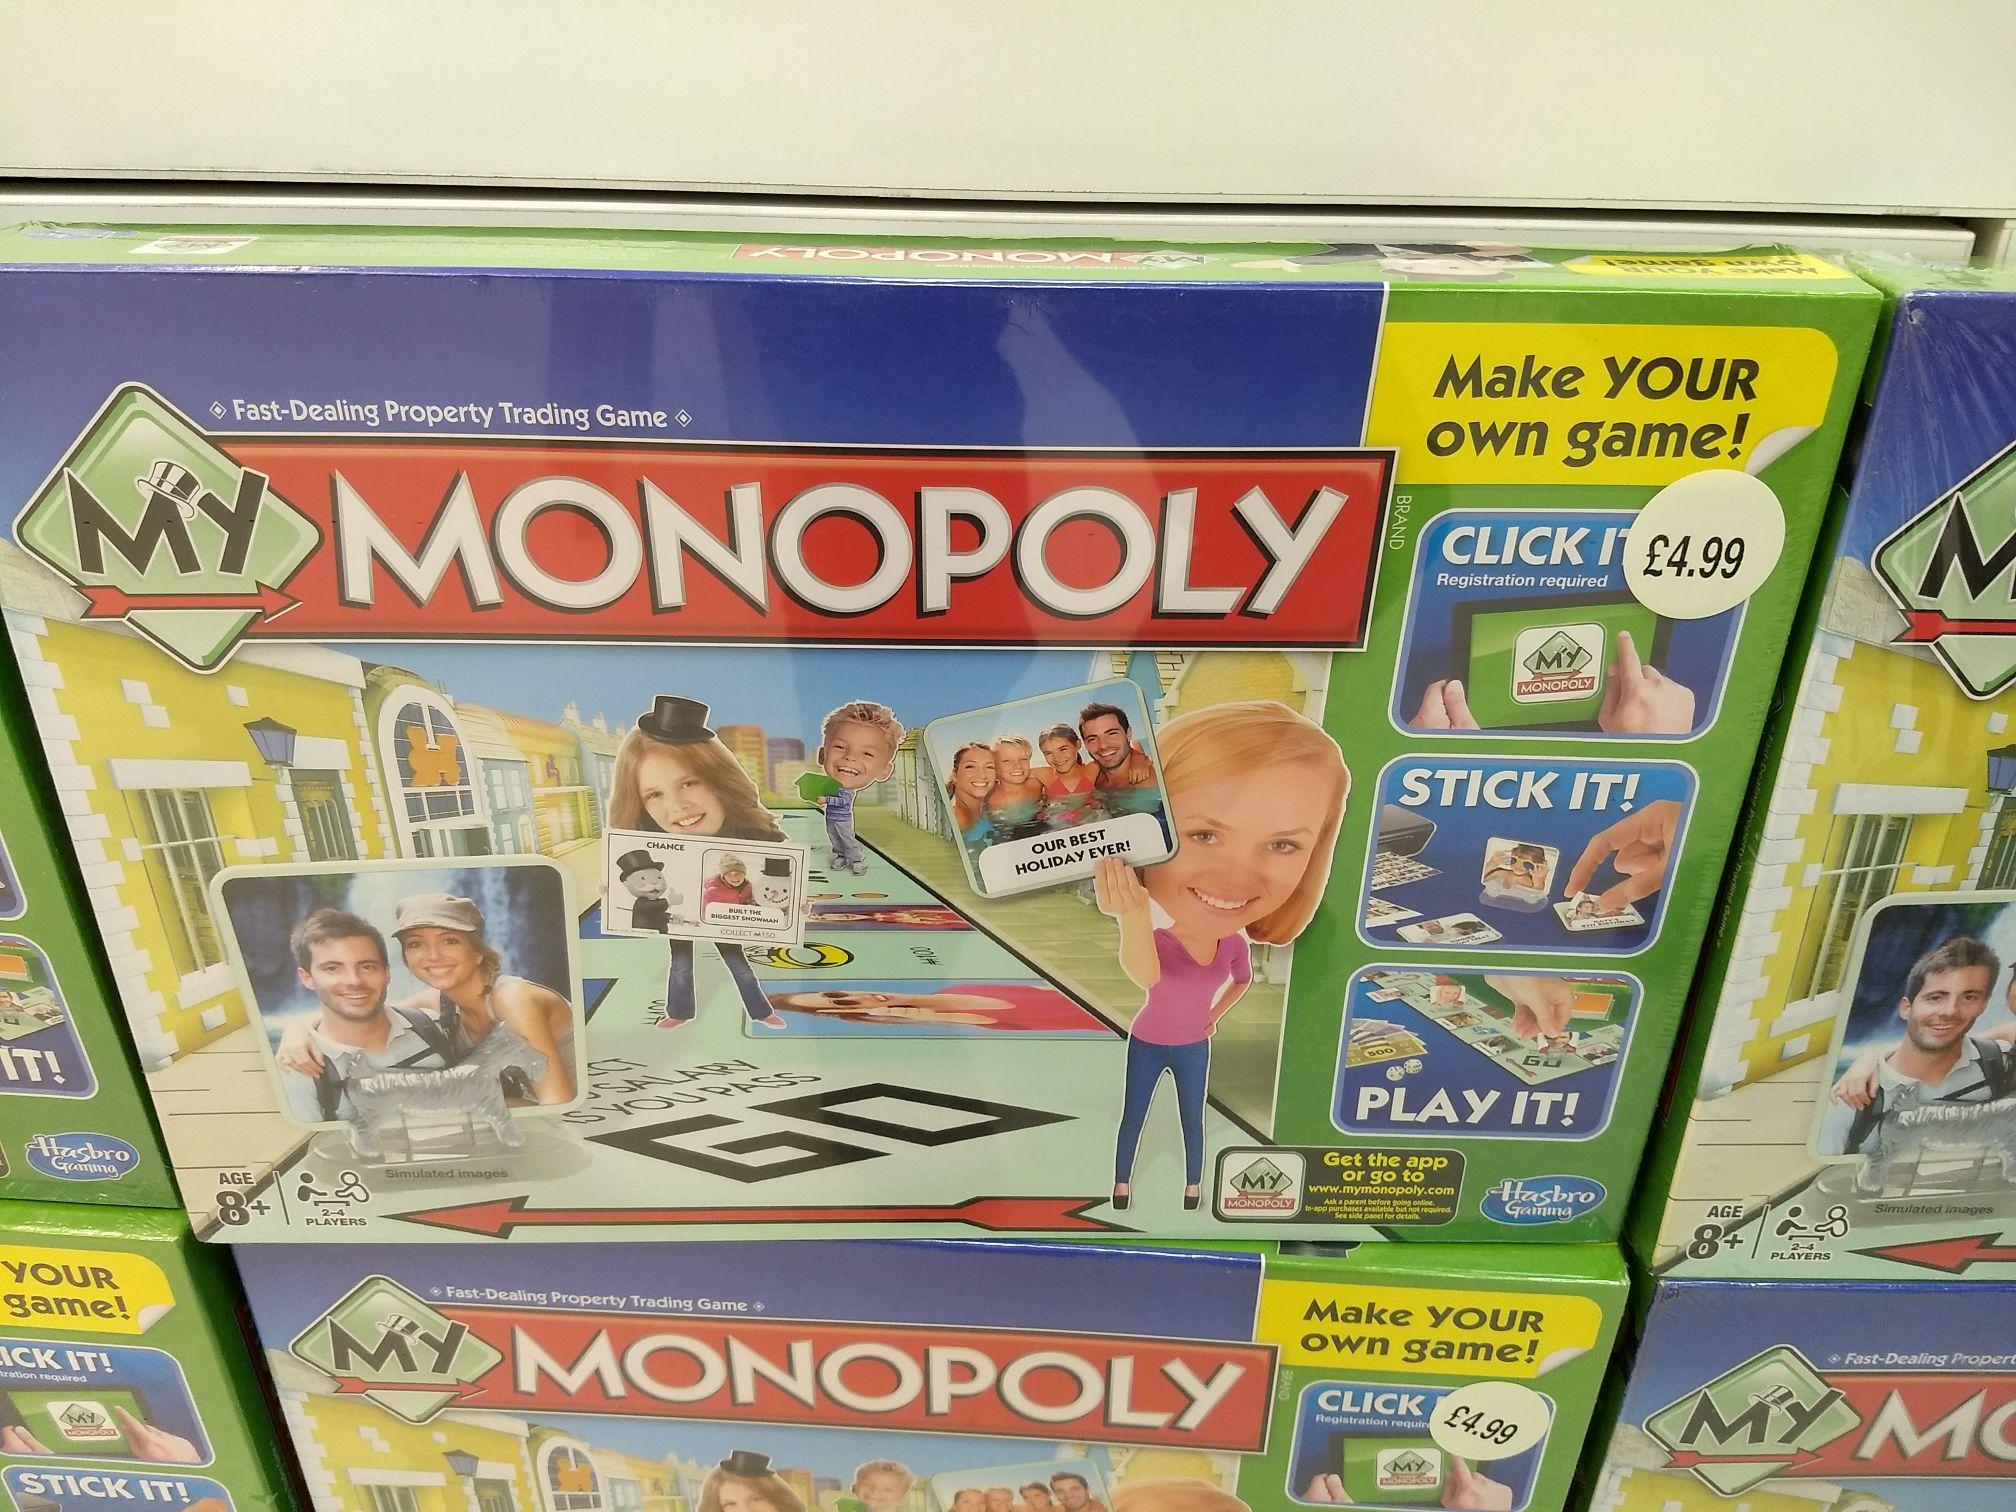 My Monopoly, W H Smith's Tunbridge Wells £4.99